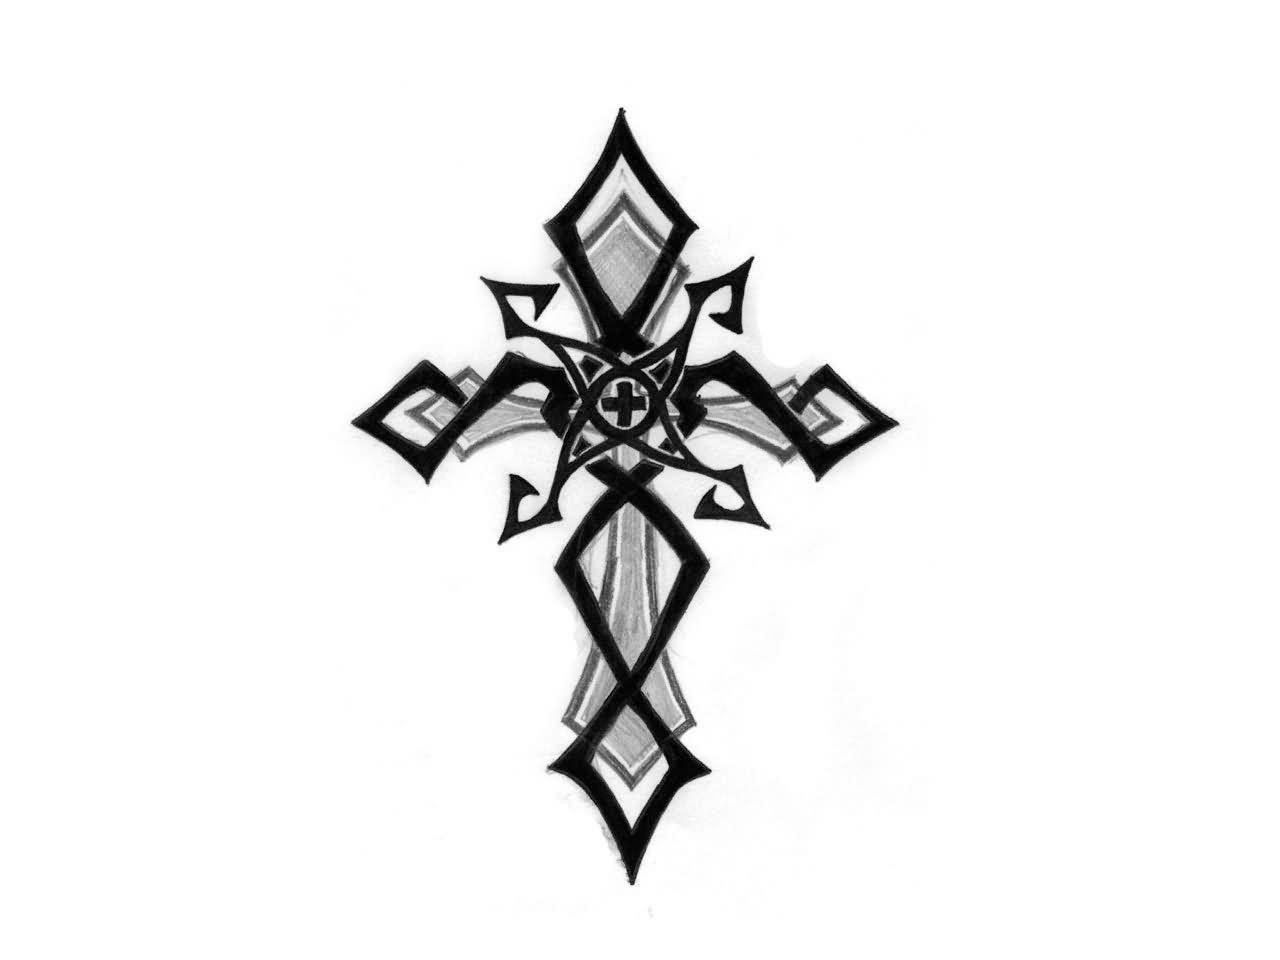 1280x960 Black Grey Cross Tattoos Cross Tattoo Images Designs